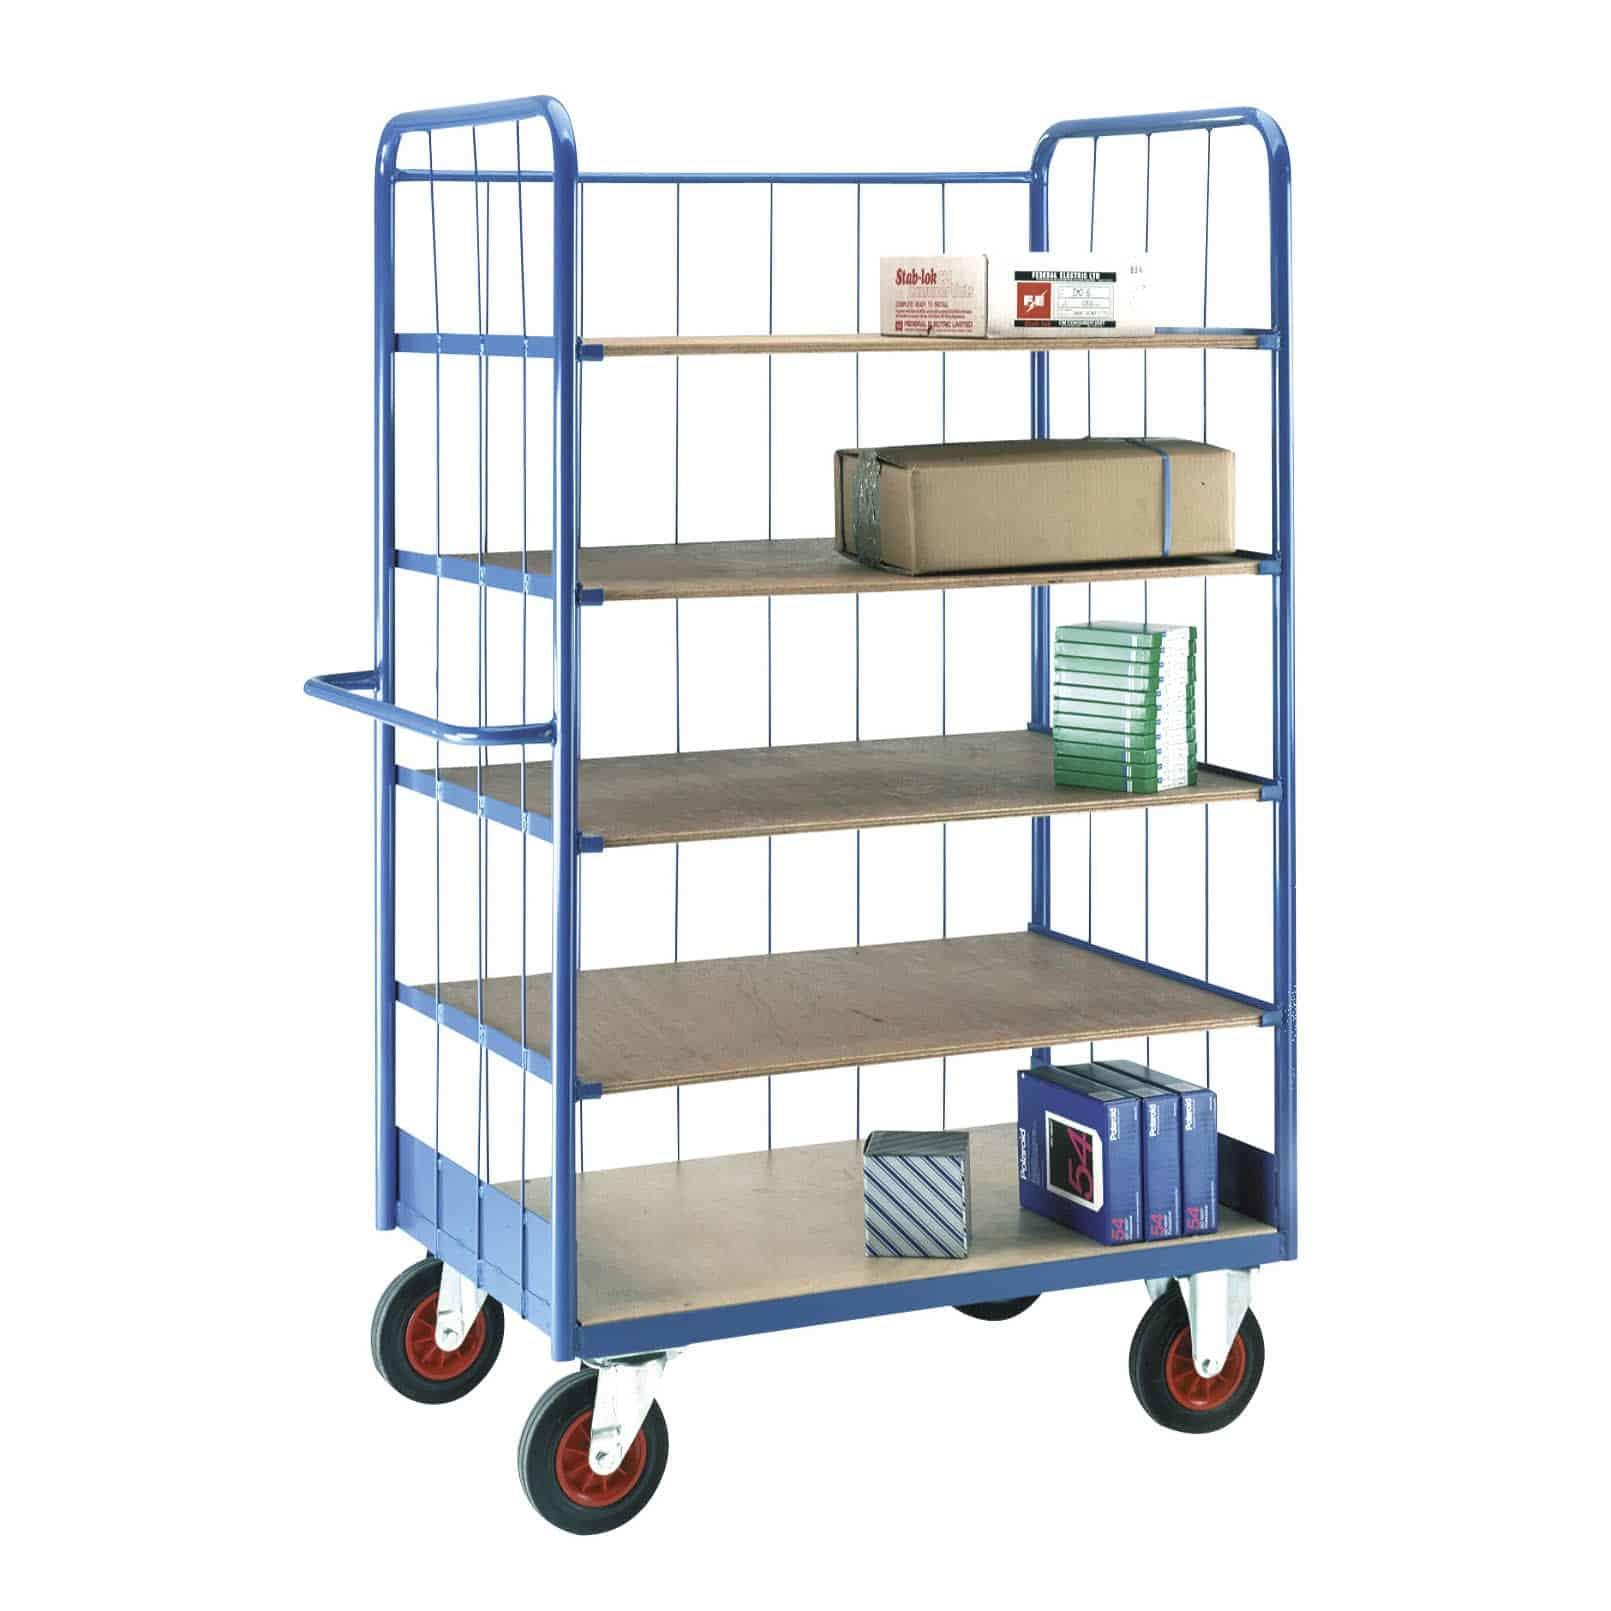 Rod Superstructure Shelf Truck